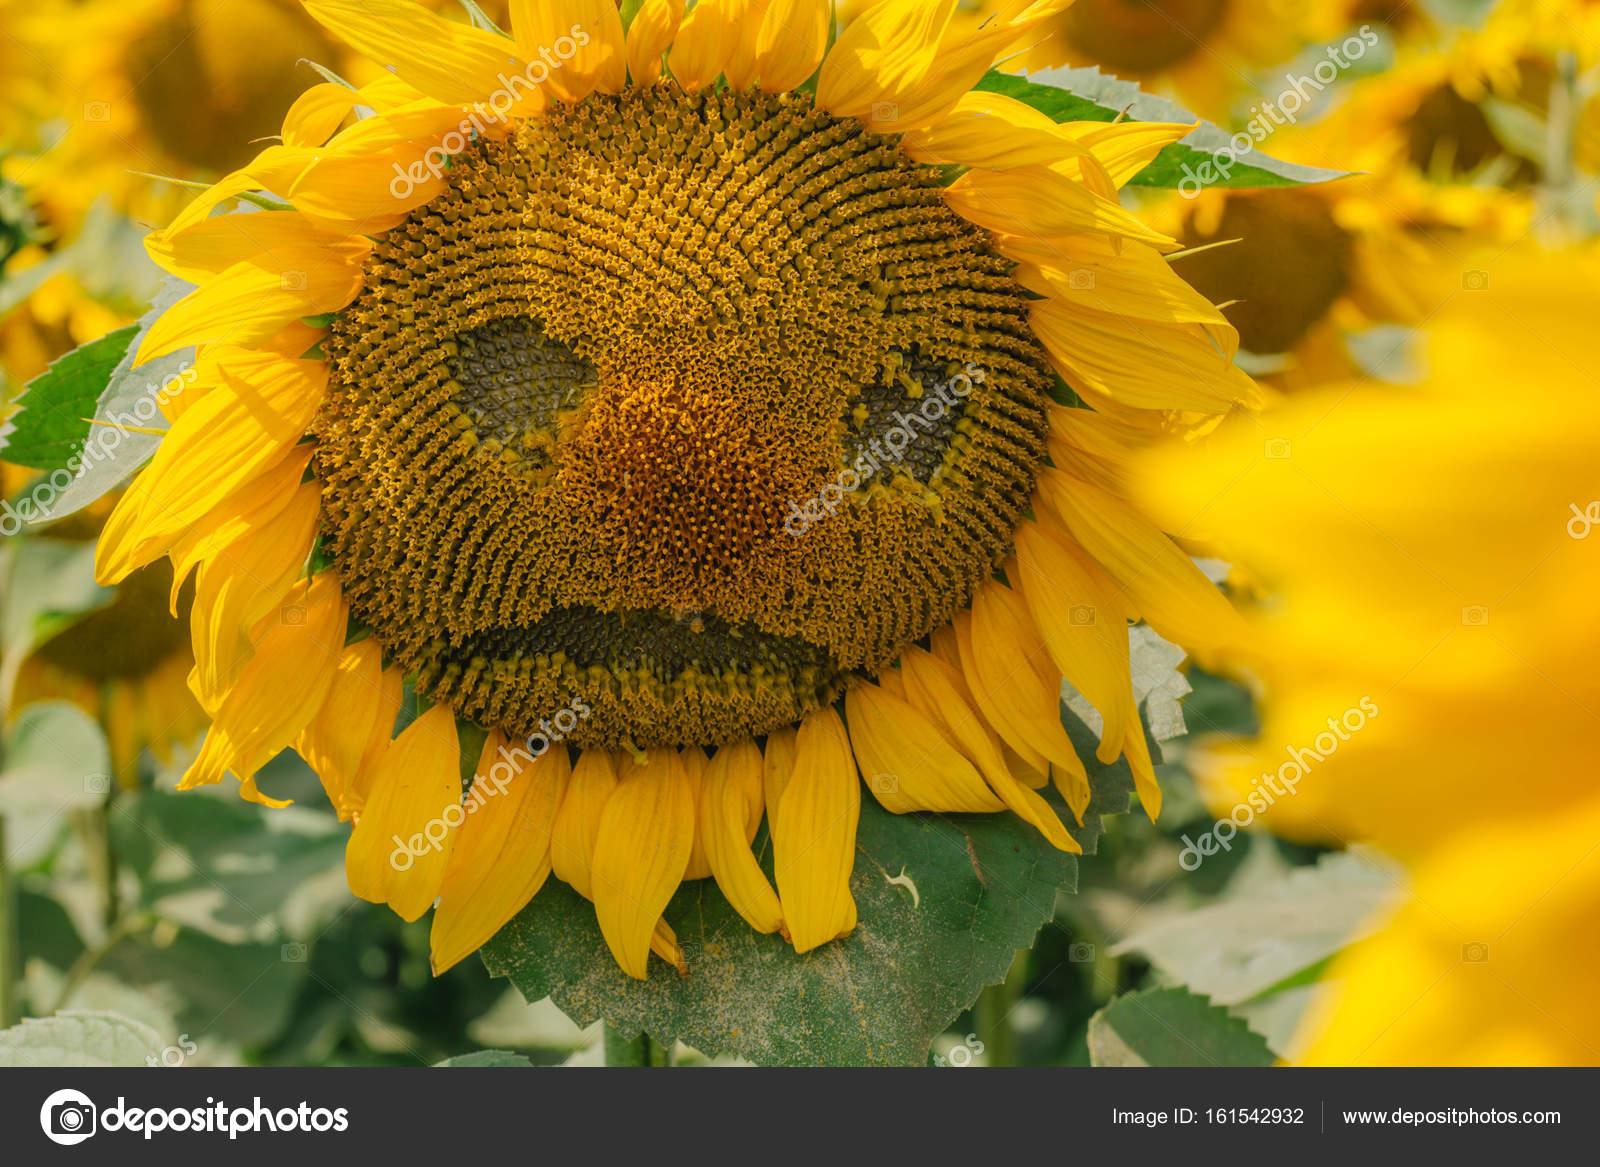 Sunflower Desktop Wallpaper Sad Sunflower Field With Sunflowers Stock Photo C Stockadrik 161542932